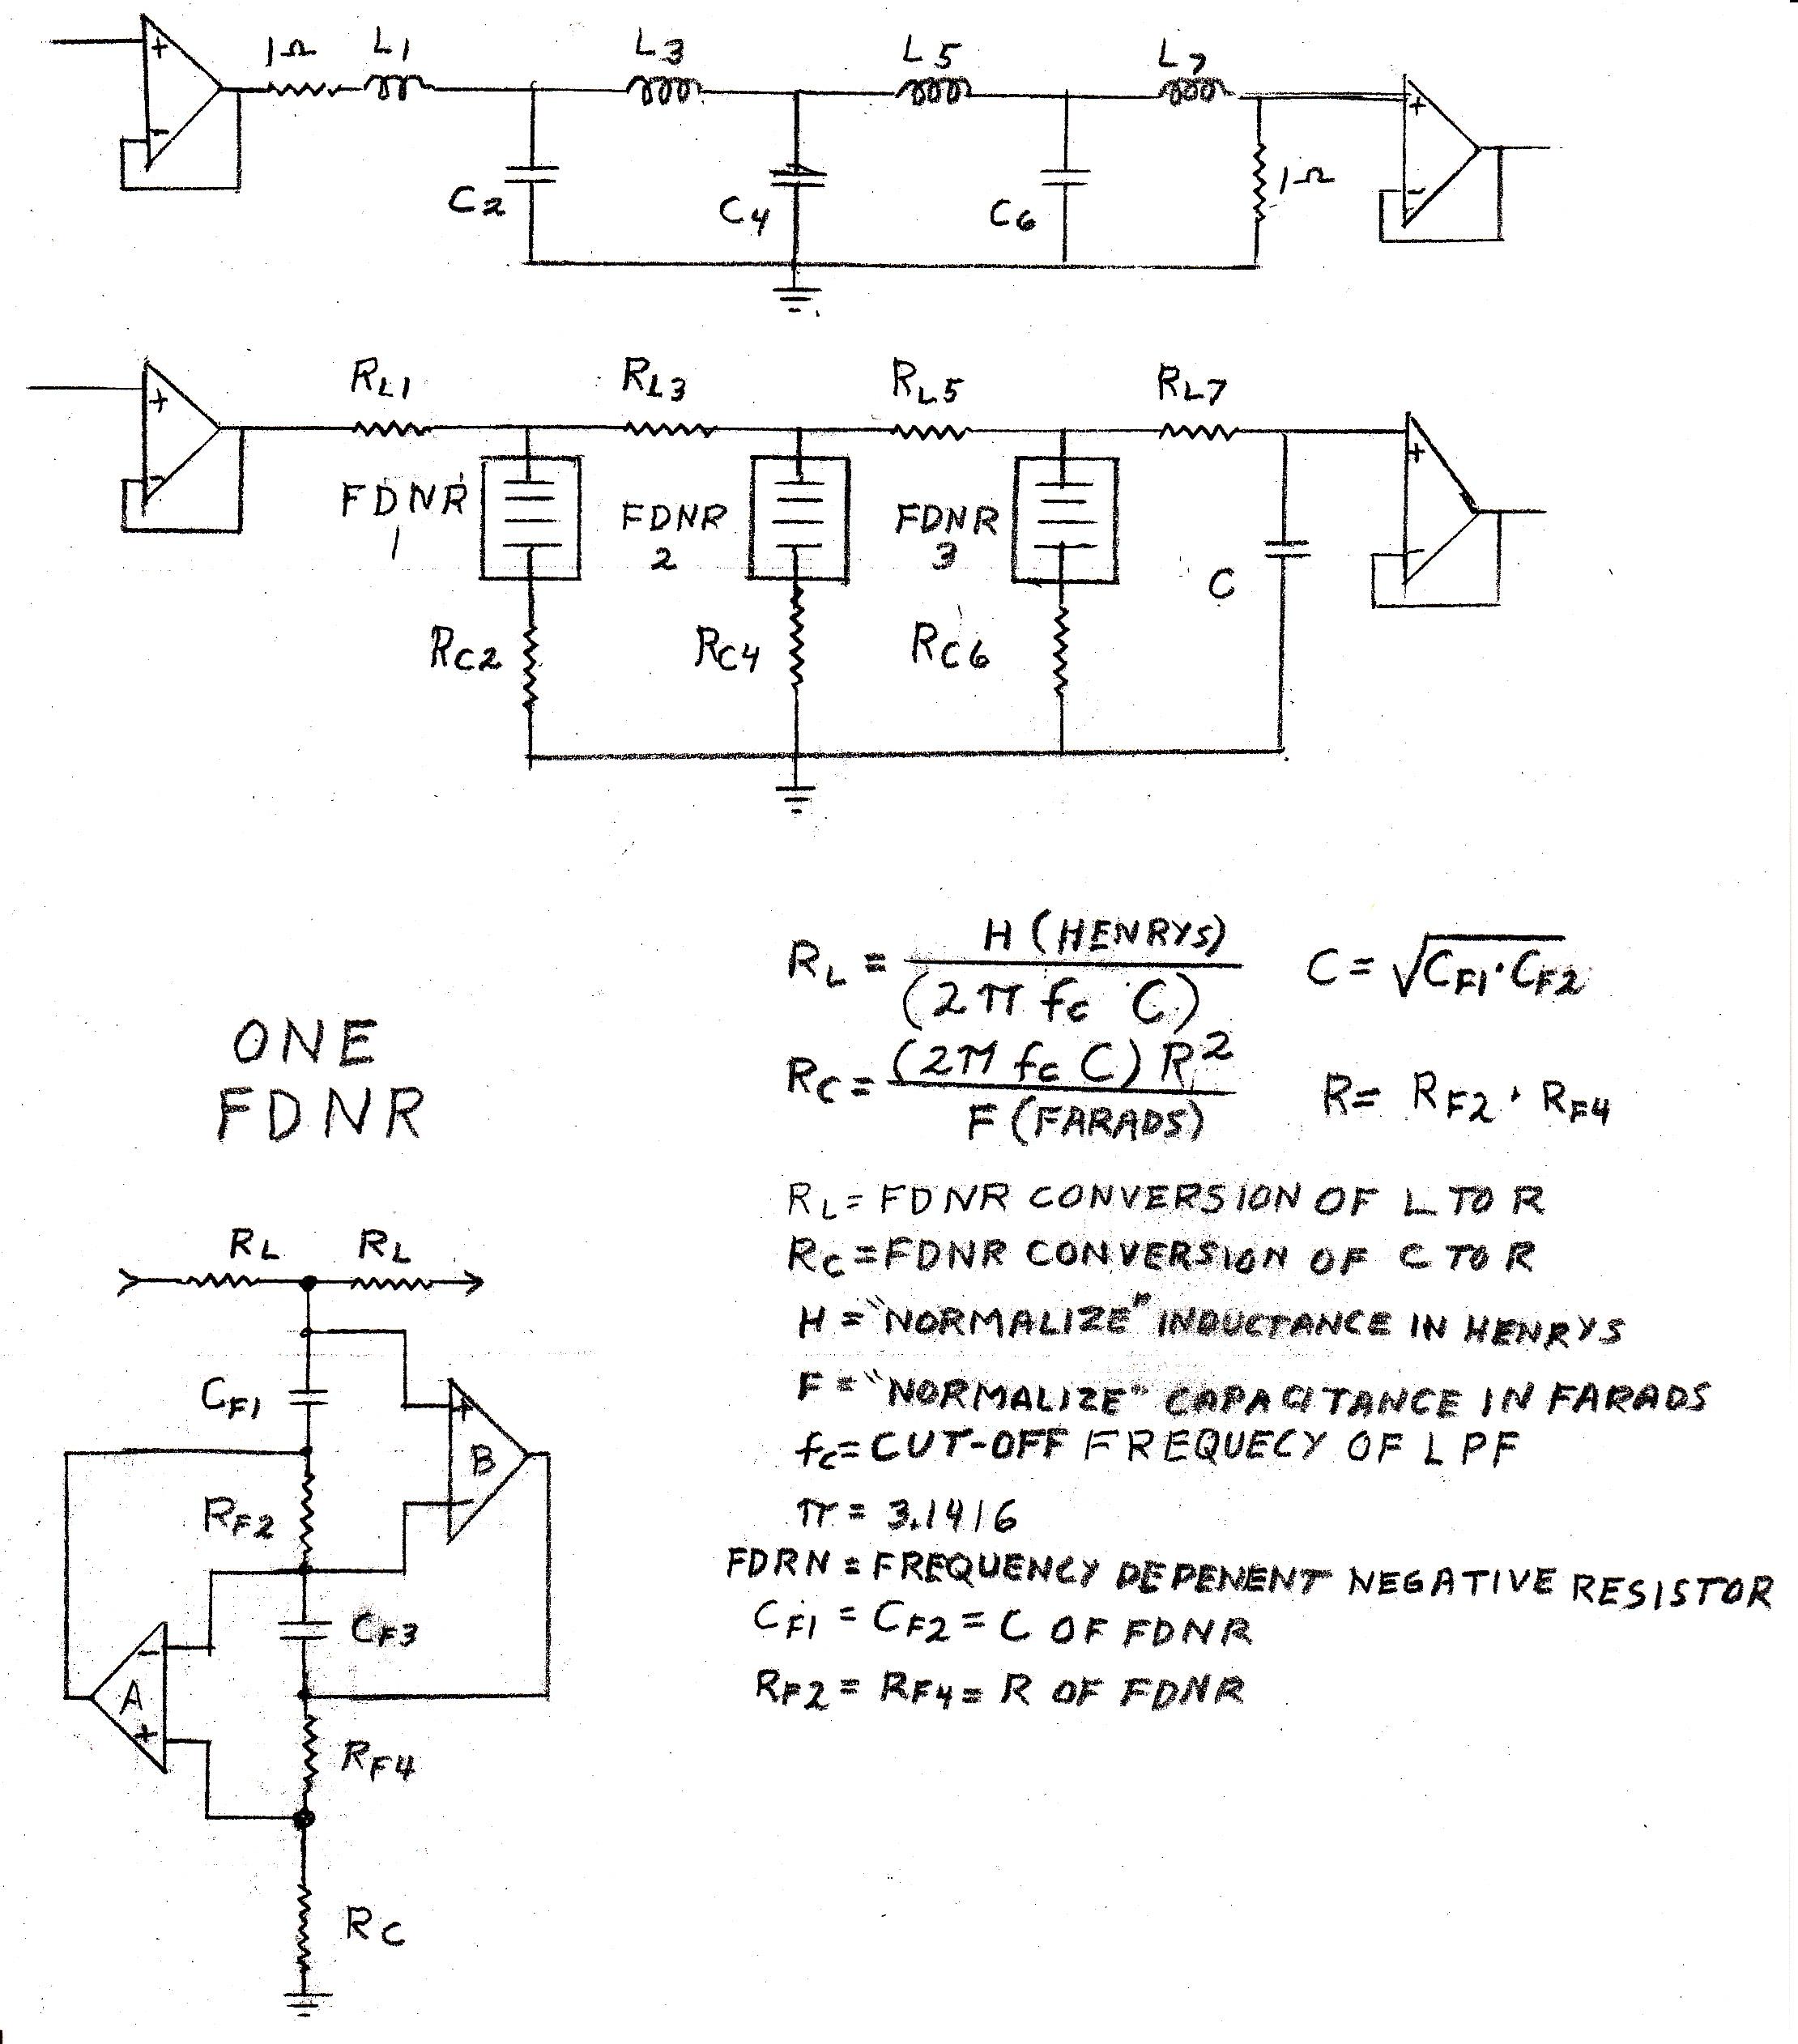 twisted pair wiring diagram 2000 gmc sierra 1500 trailer fdnr filter design formulas fm systems